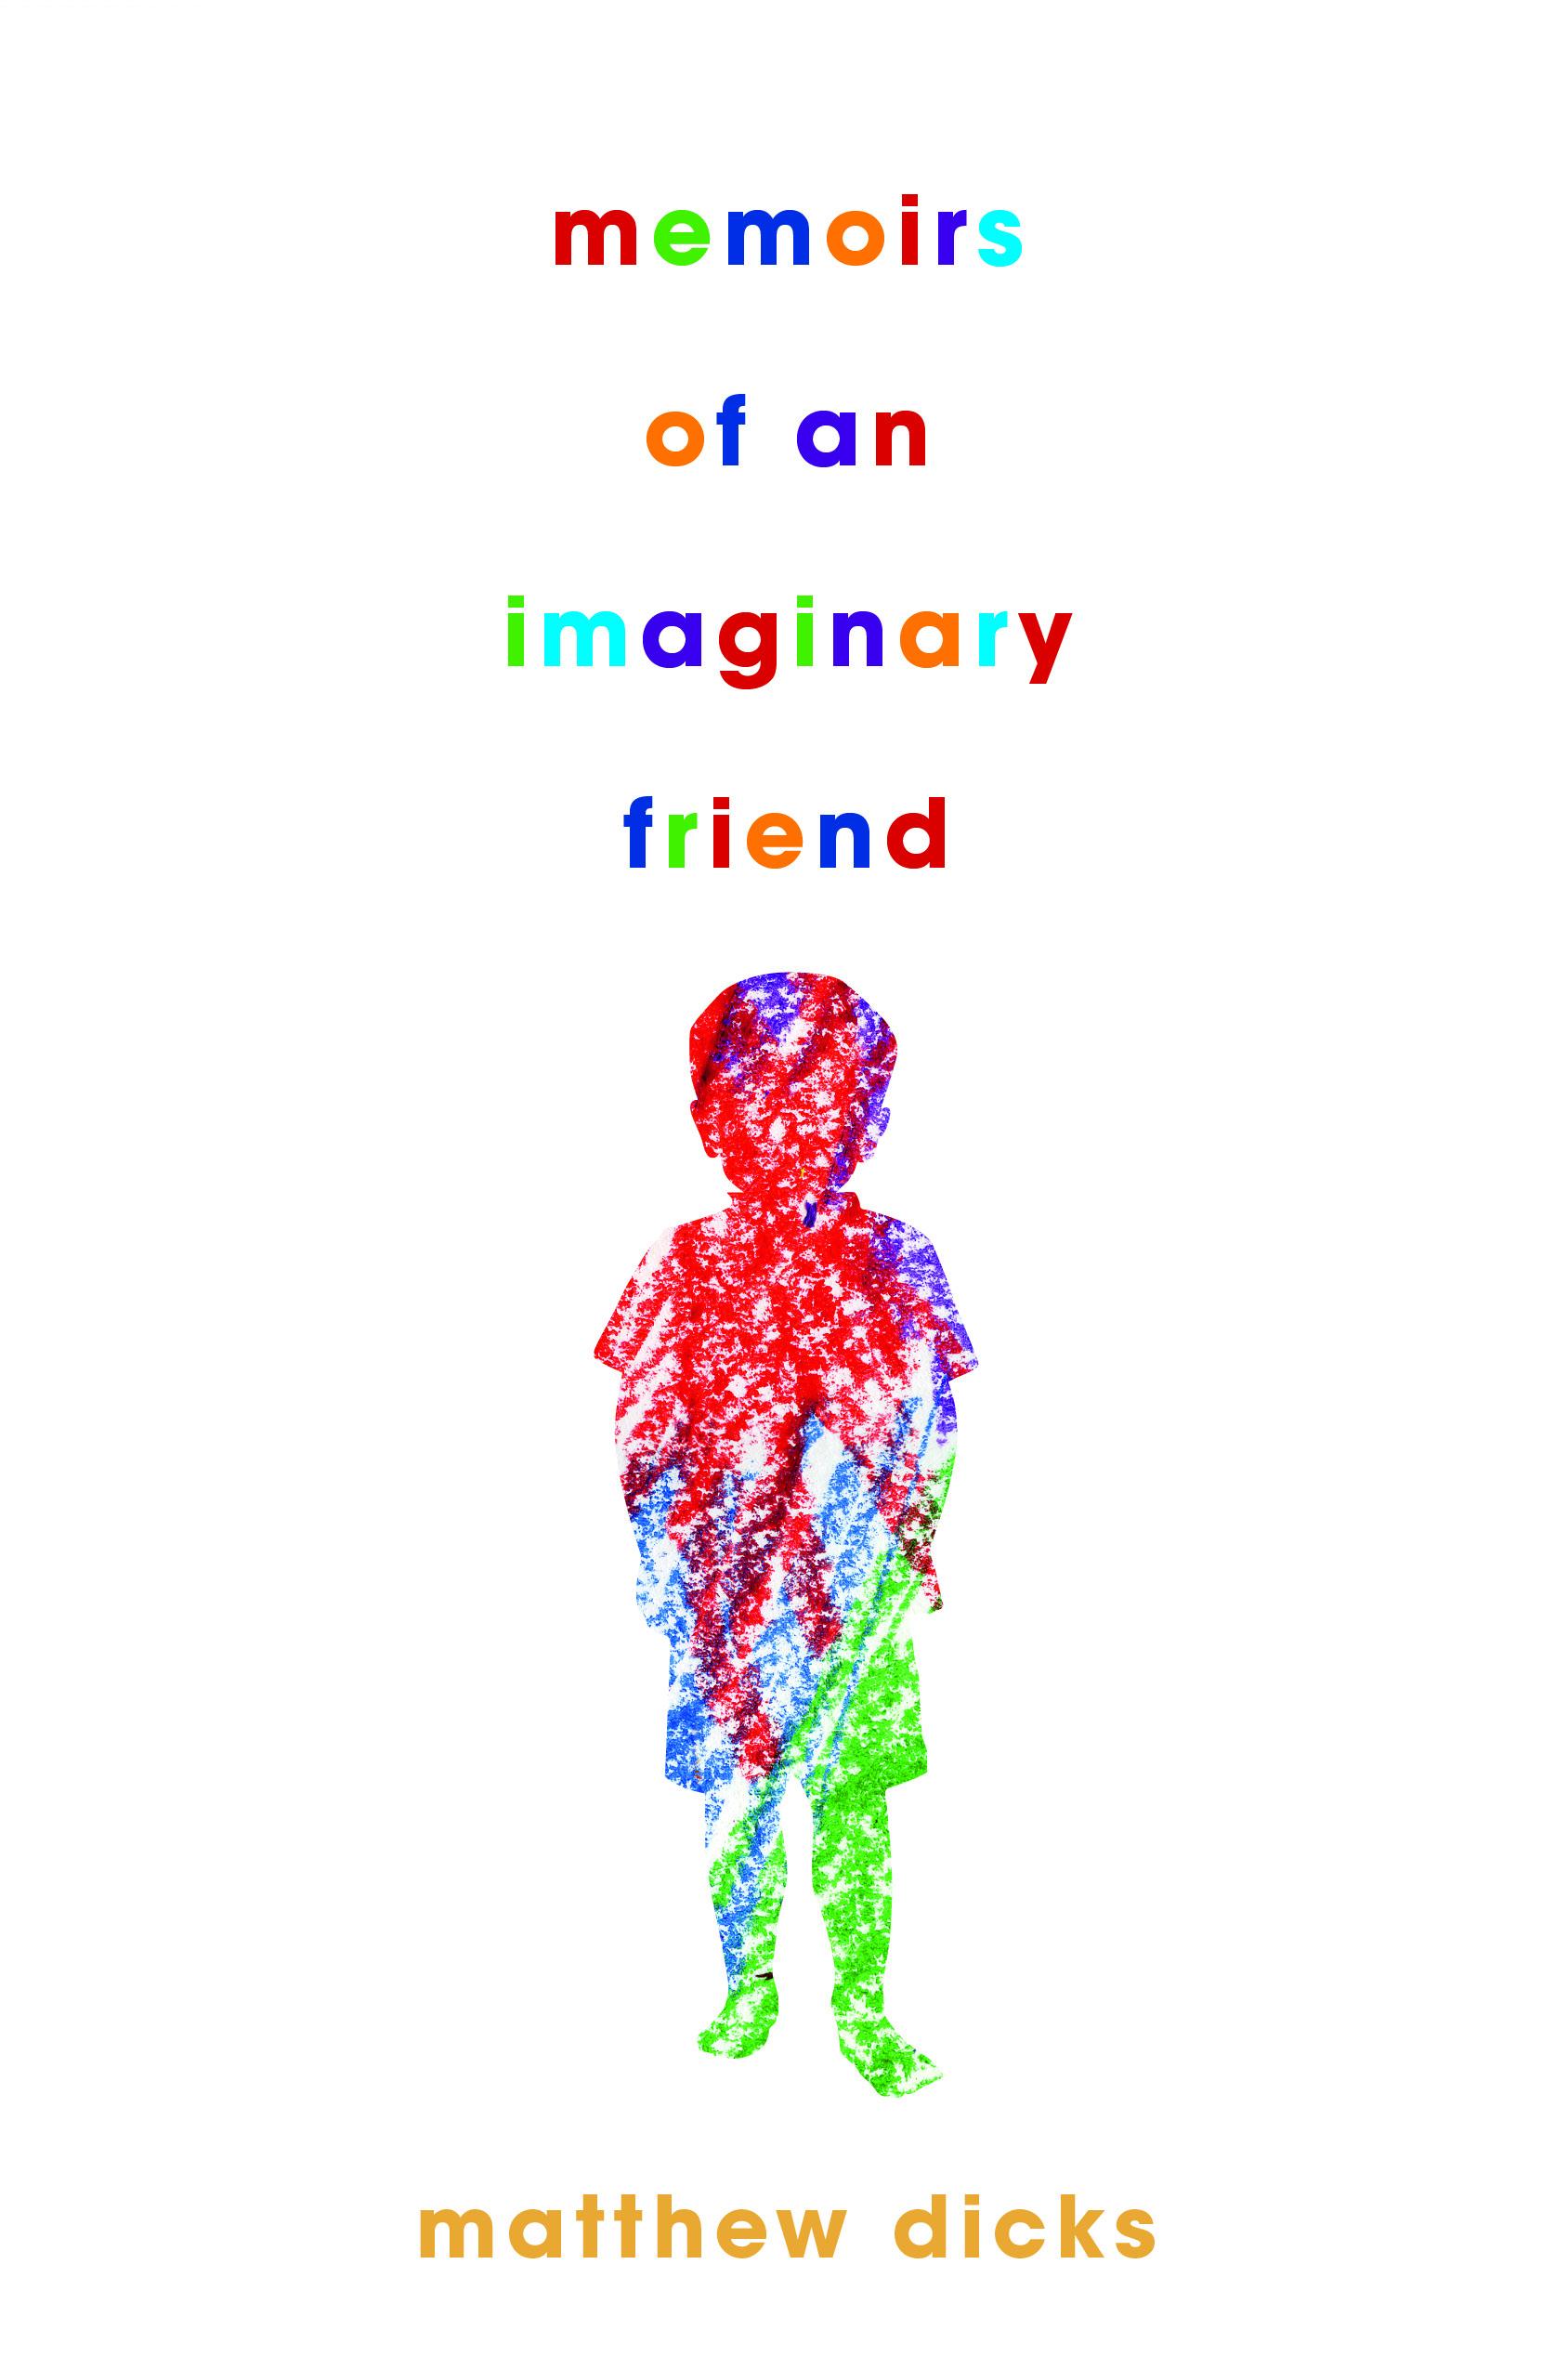 Memoirs of an Imaginary Friend Cover 1.jpg